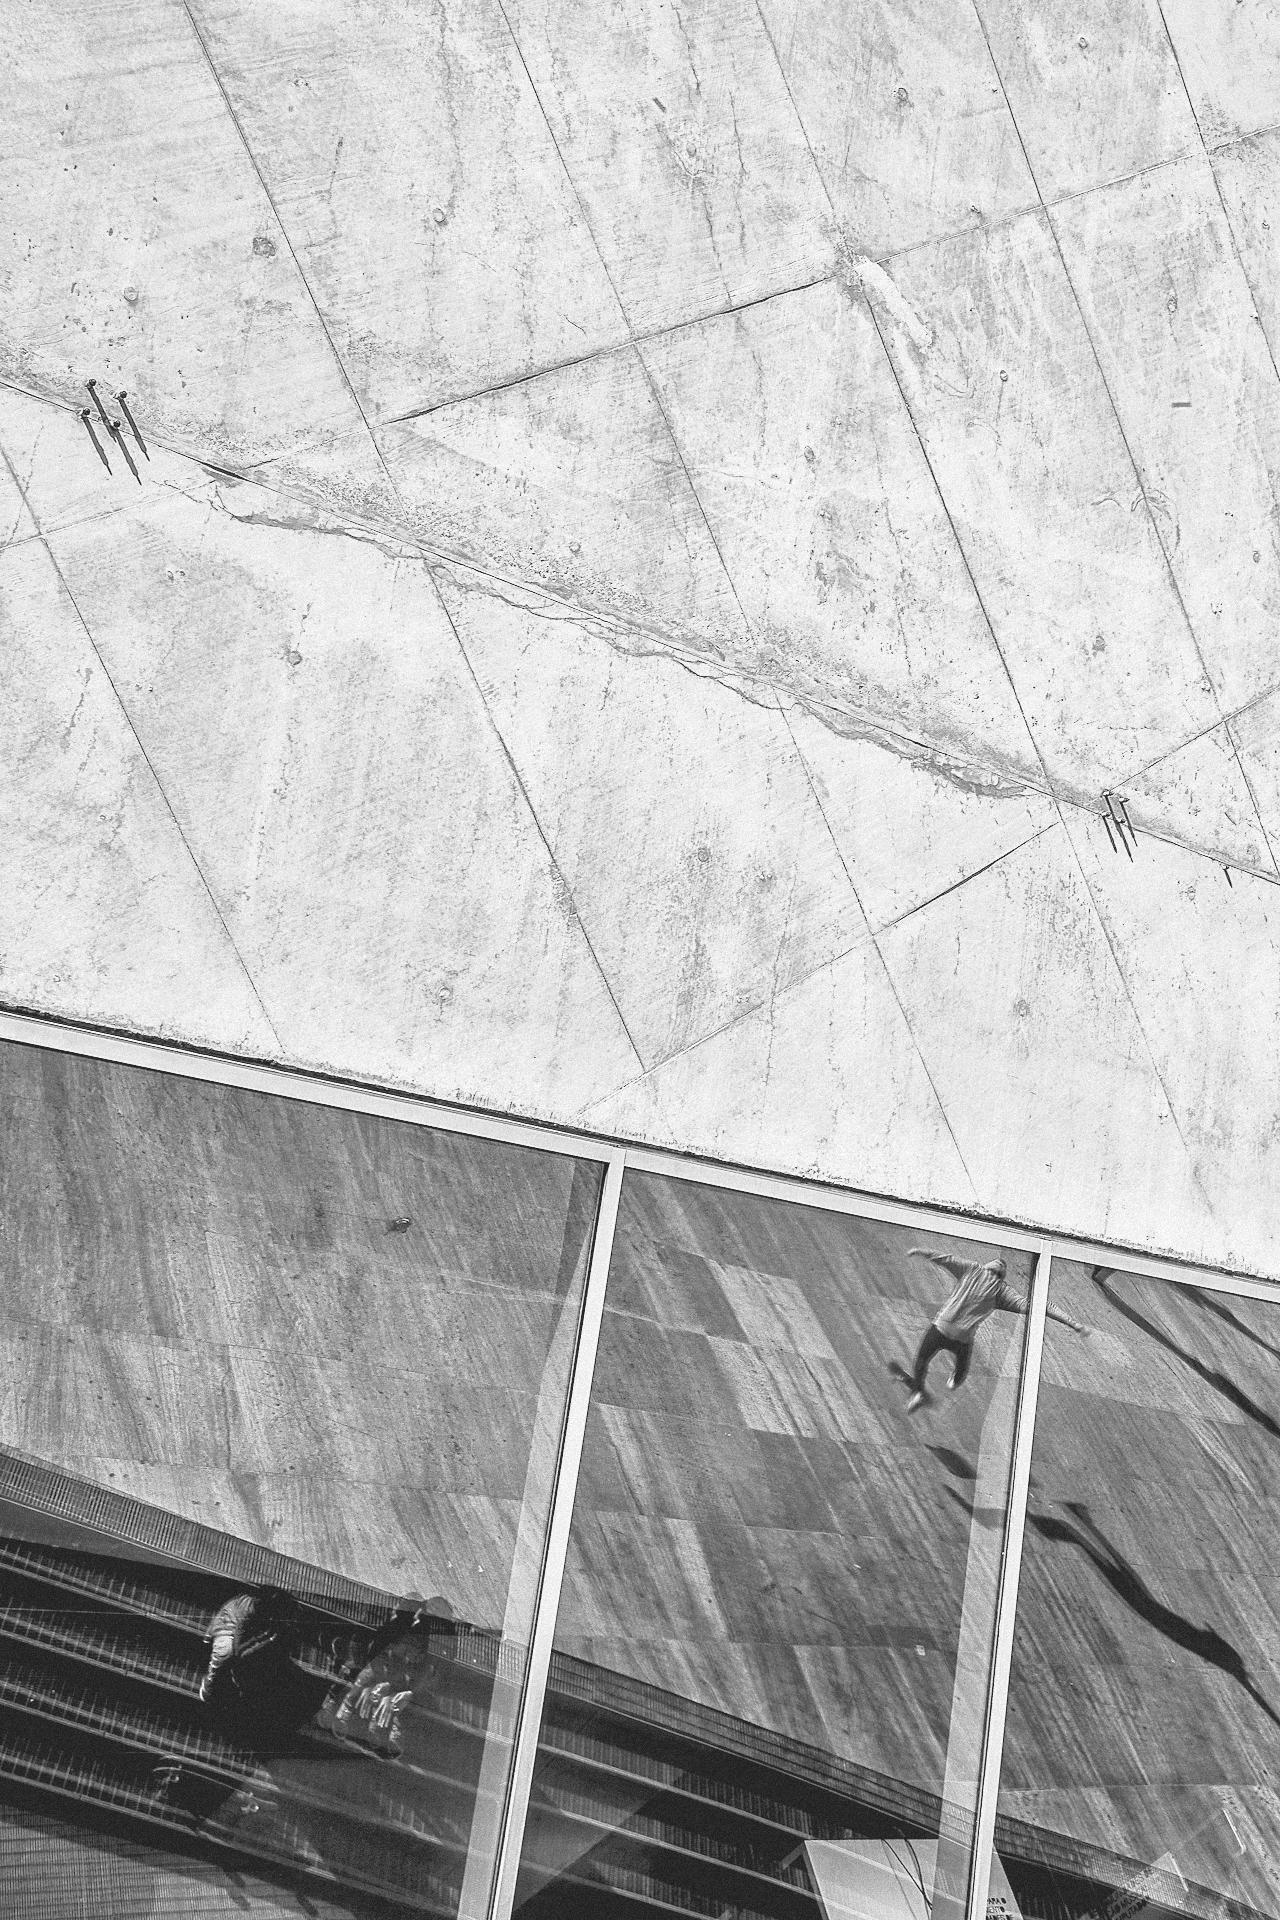 10-Aniversario-Casa-da-Musica-Porto-Reportagem-Fotografica-Photographic-Coverage-Fotografia-Photography-Arquitectura-Architecture-Rem-Koolhaas-bonjourmolotov-45N3.jpg